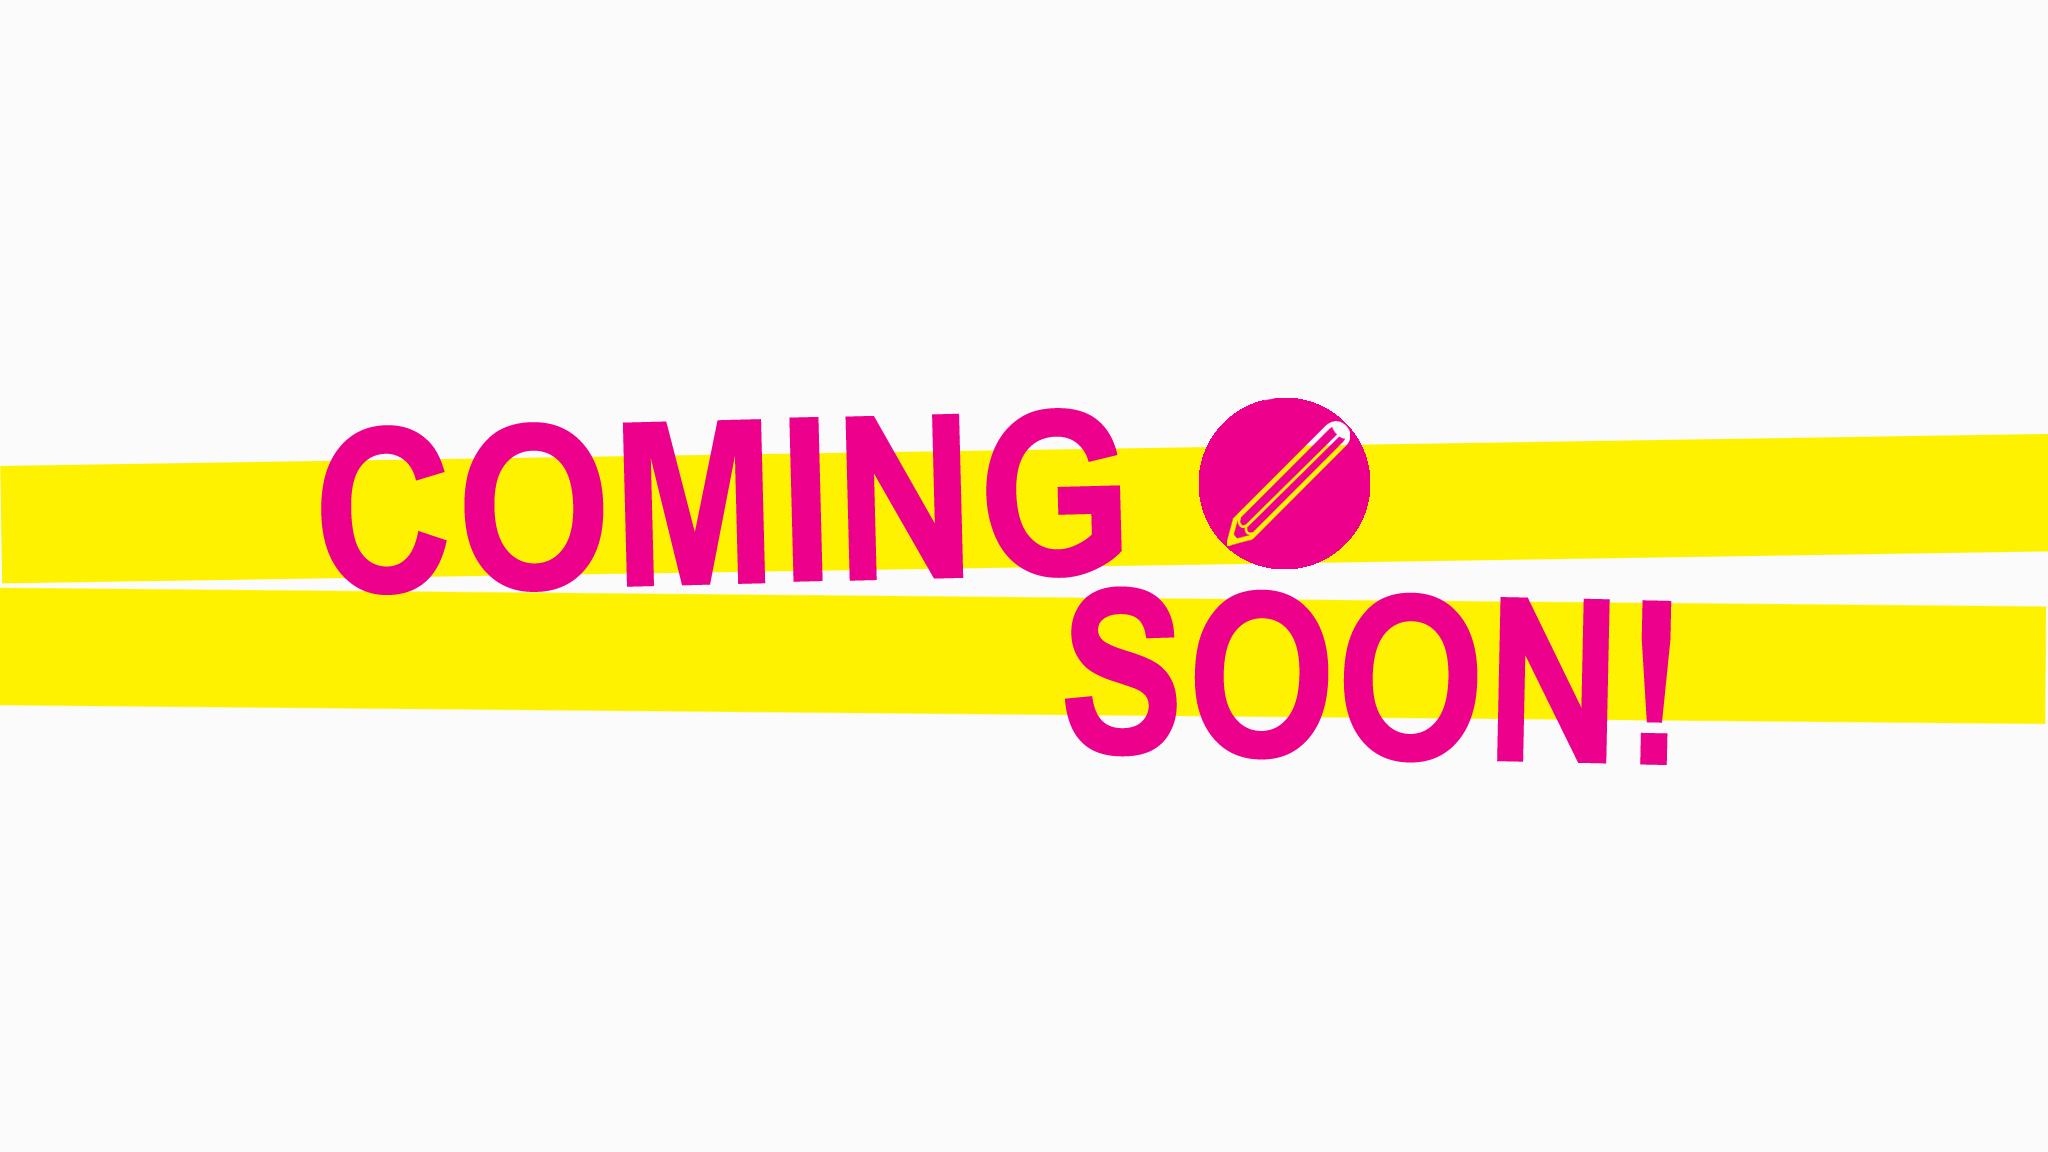 Design Toolkit COMING SOON logo.jpg